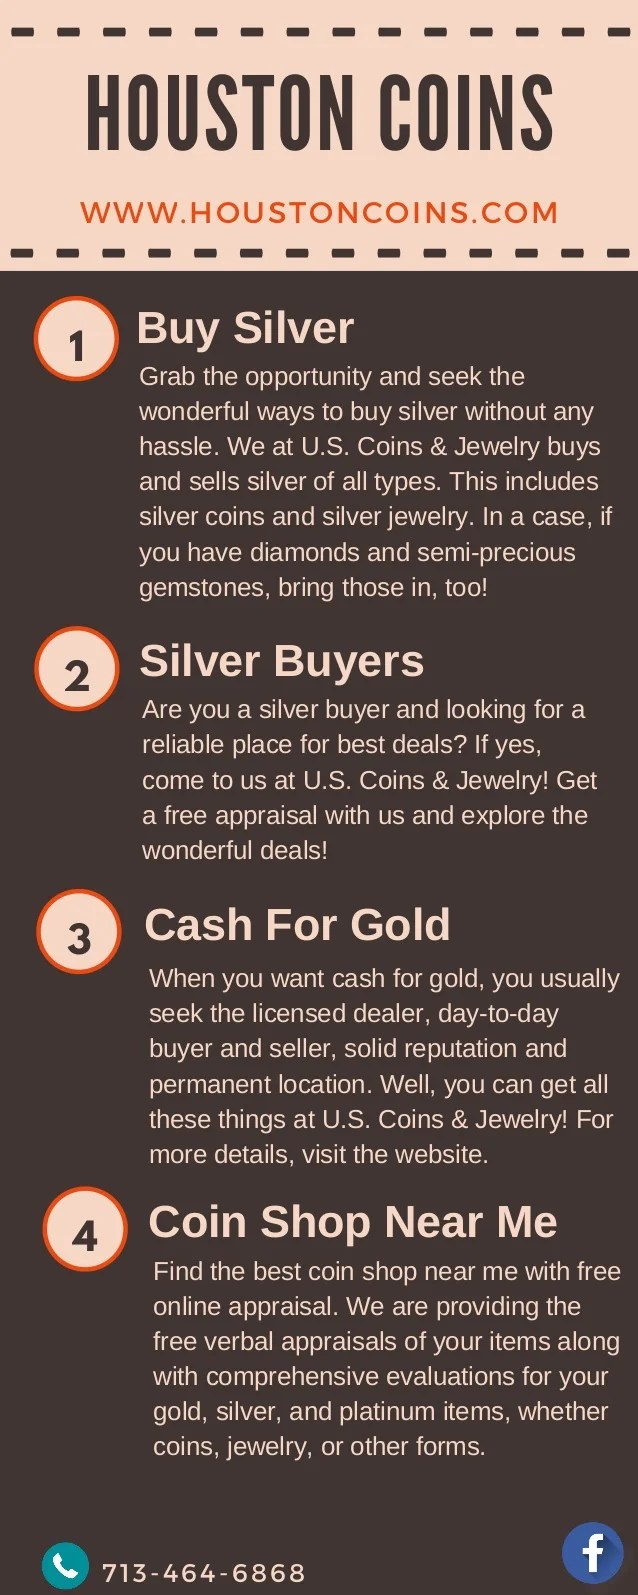 Who Buys Silver Near Me : silver, Houston, Coins